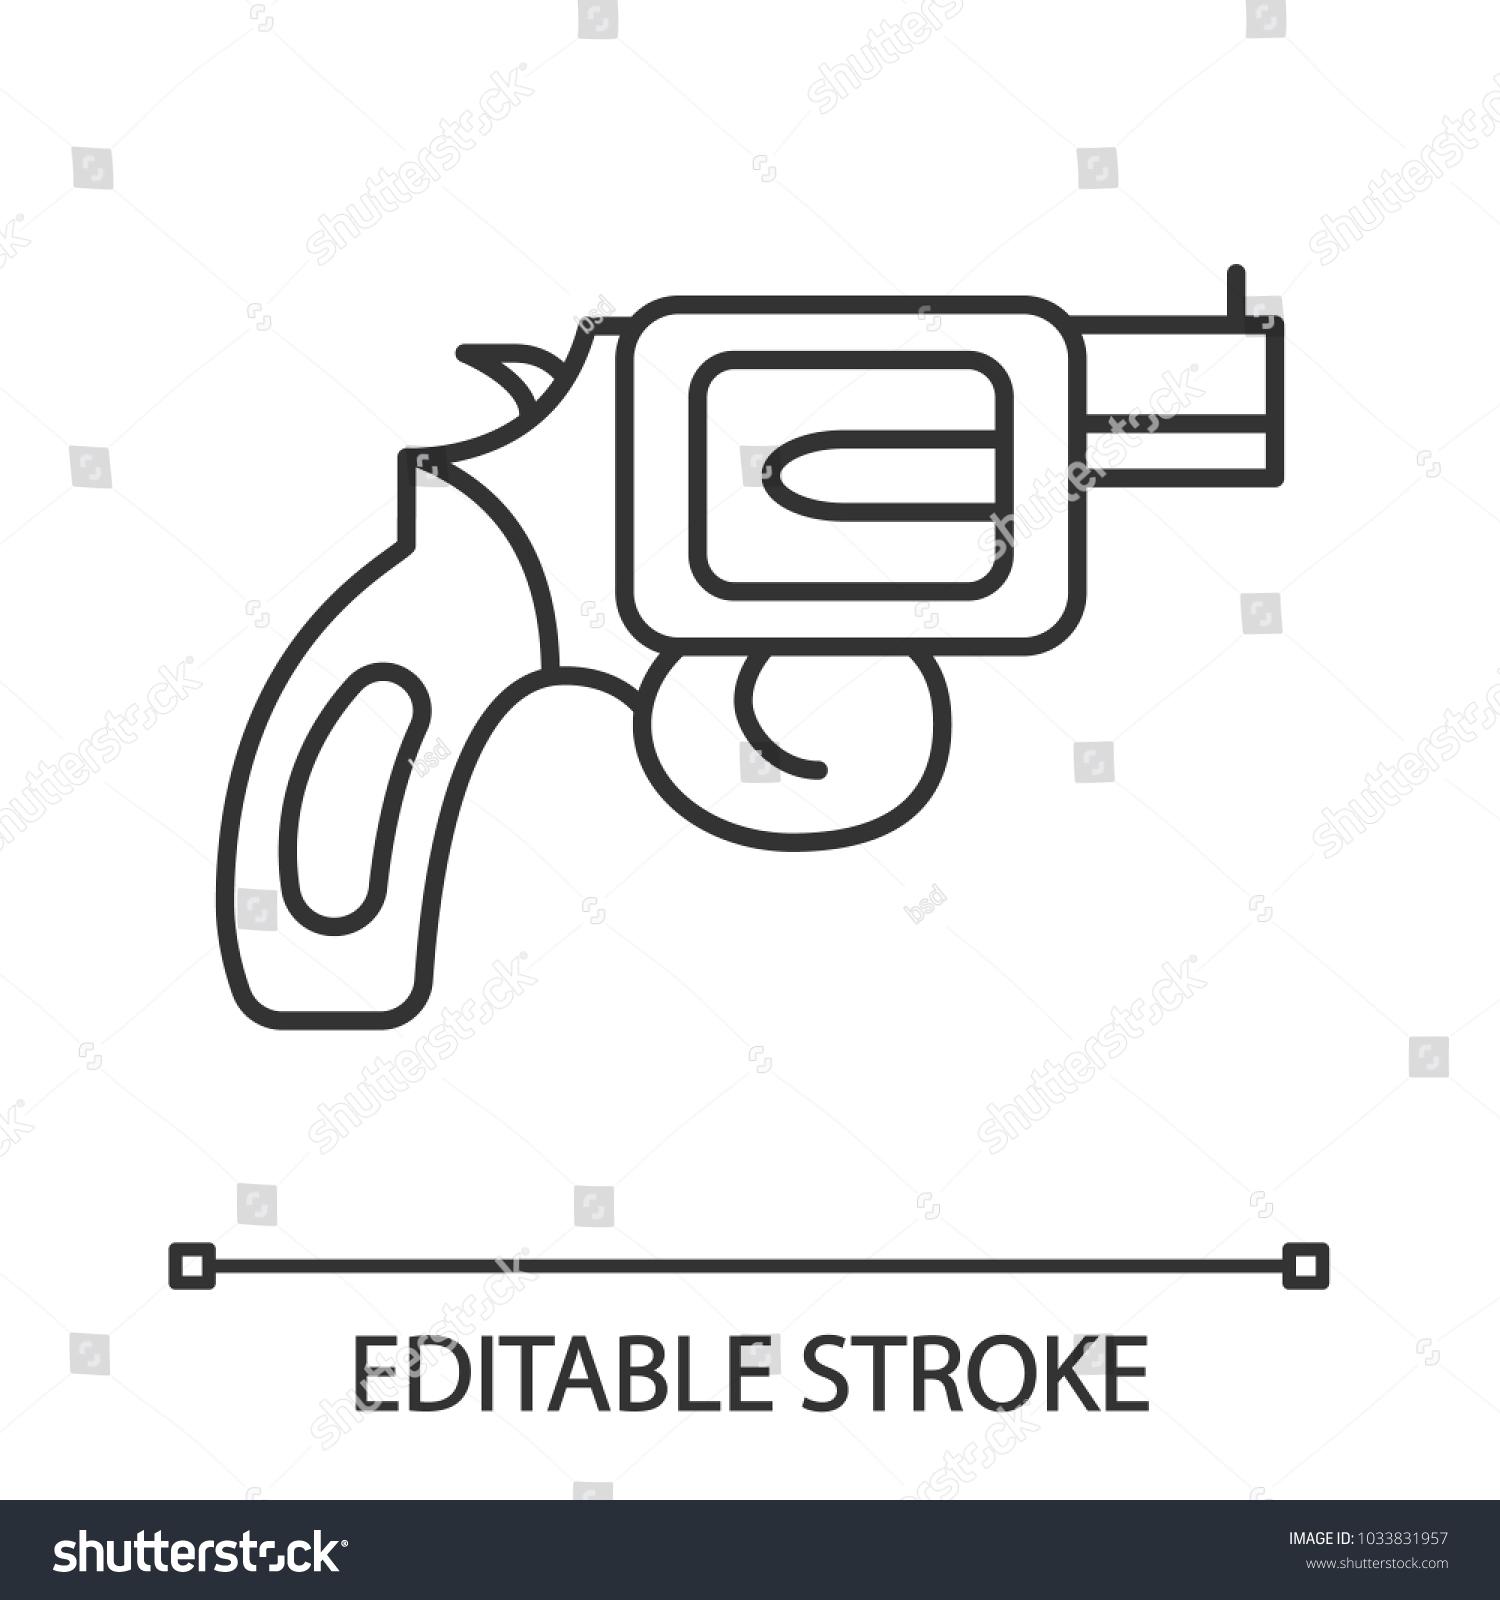 Pistol text symbol gallery symbol and sign ideas pistol text symbol choice image symbol and sign ideas revolver linear icon pistol gun thin stock buycottarizona